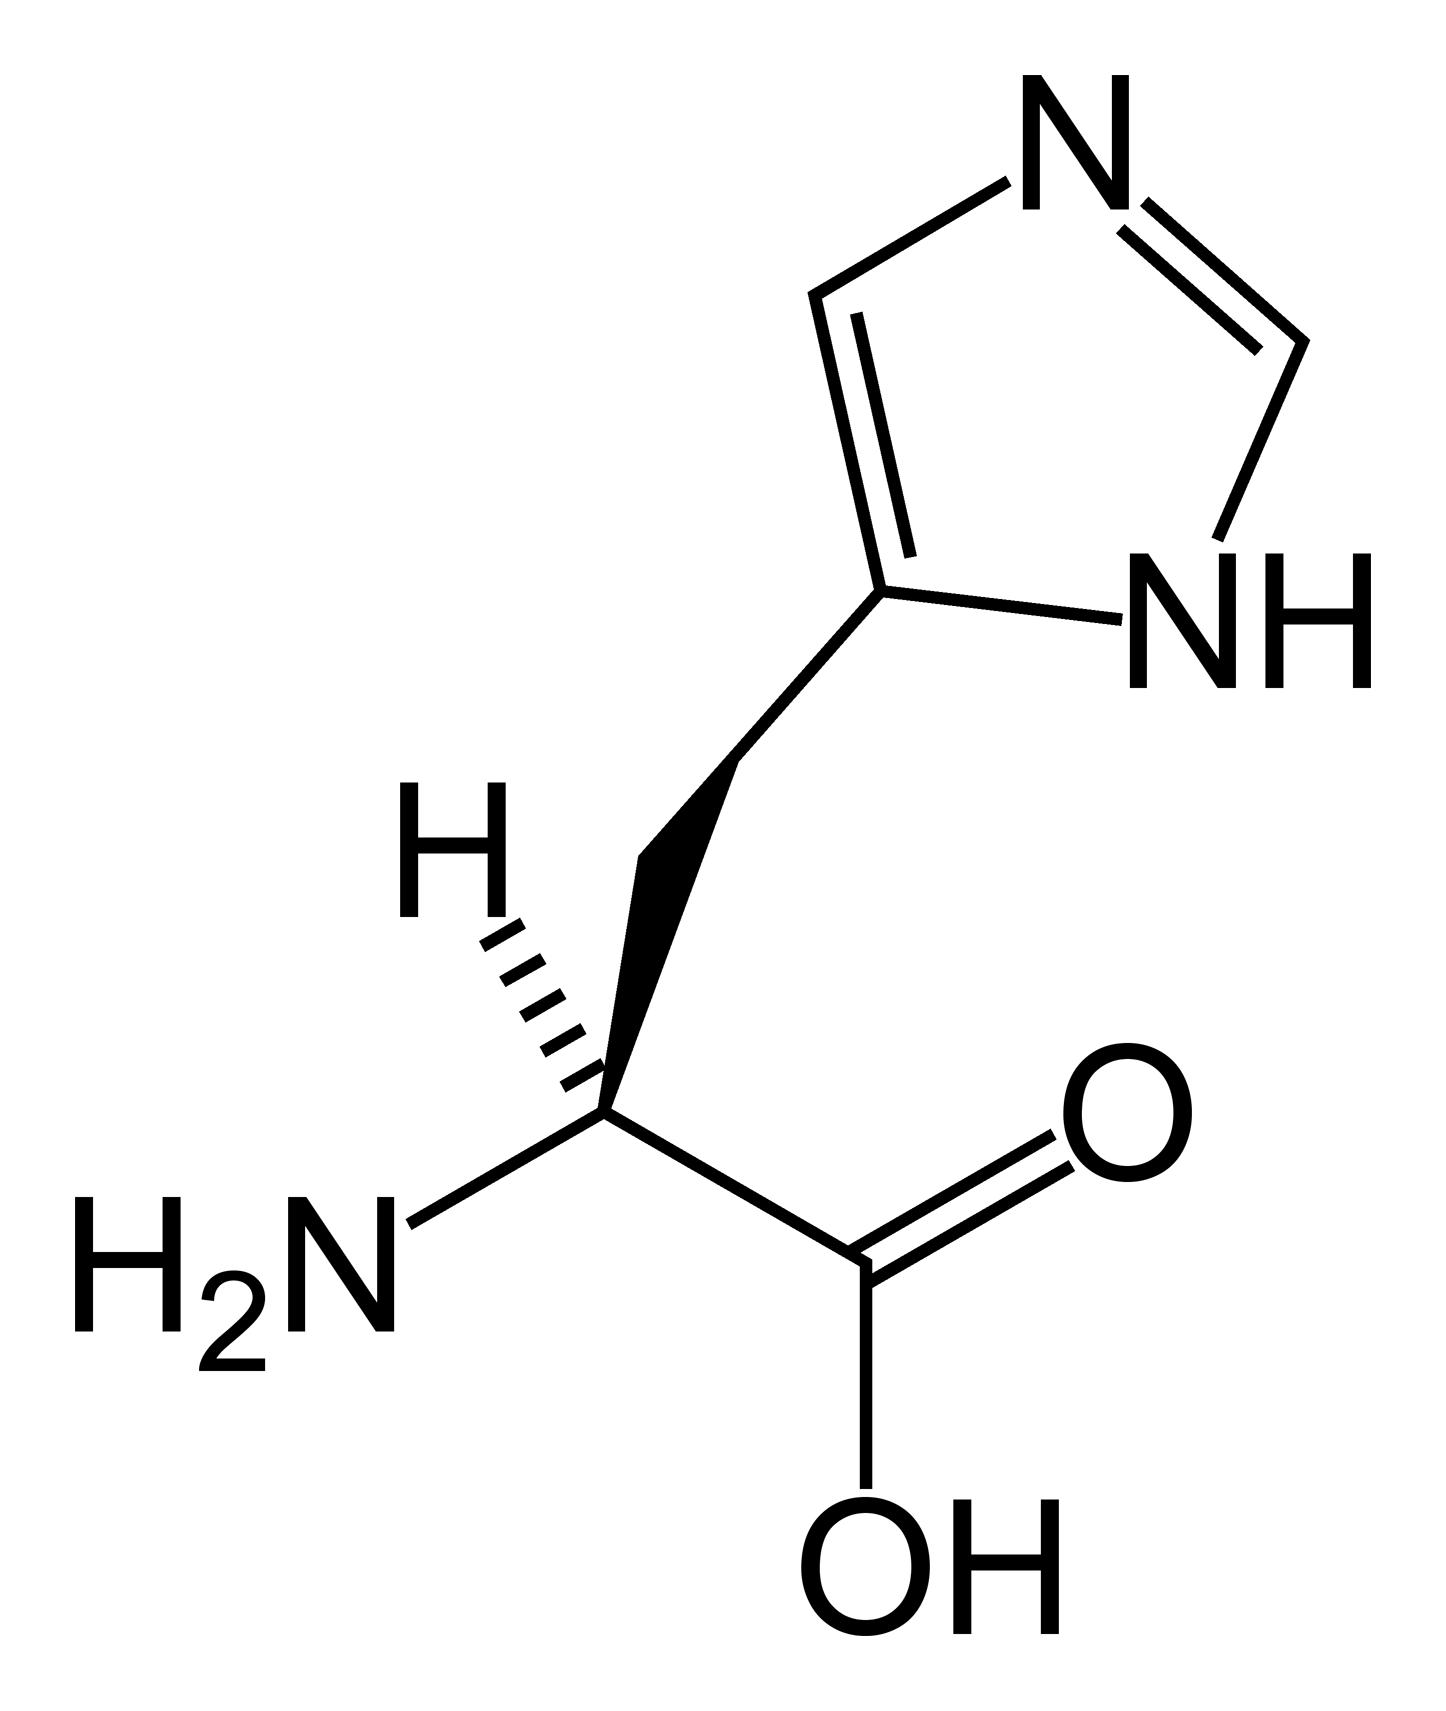 File:L-histidine-skeletal.png - Wikipedia